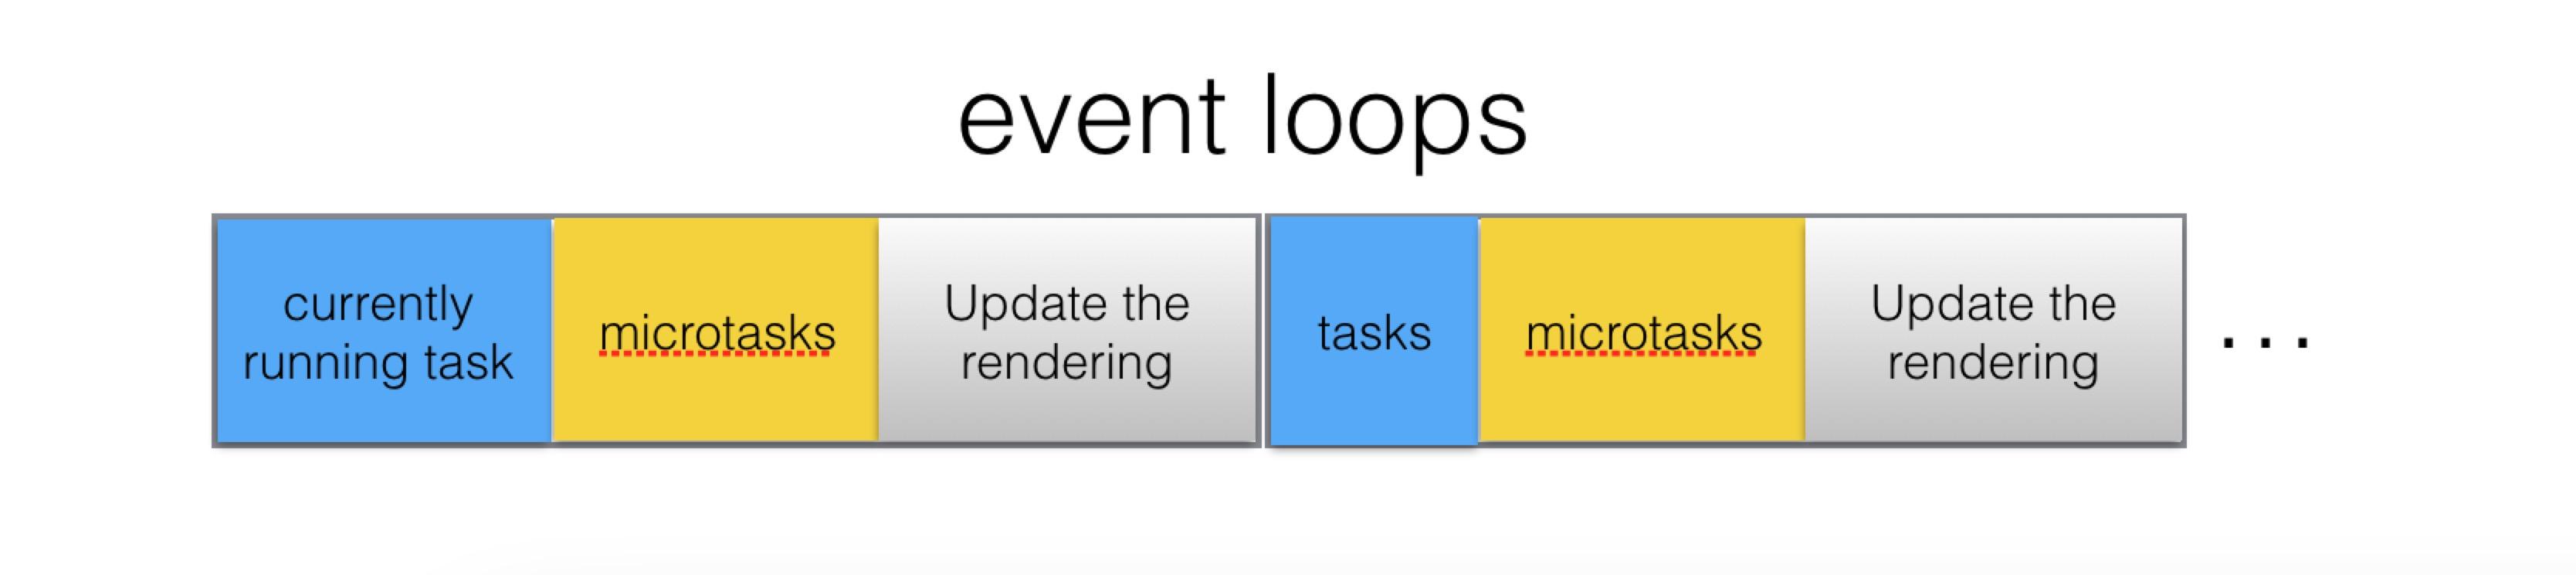 event loop 过程